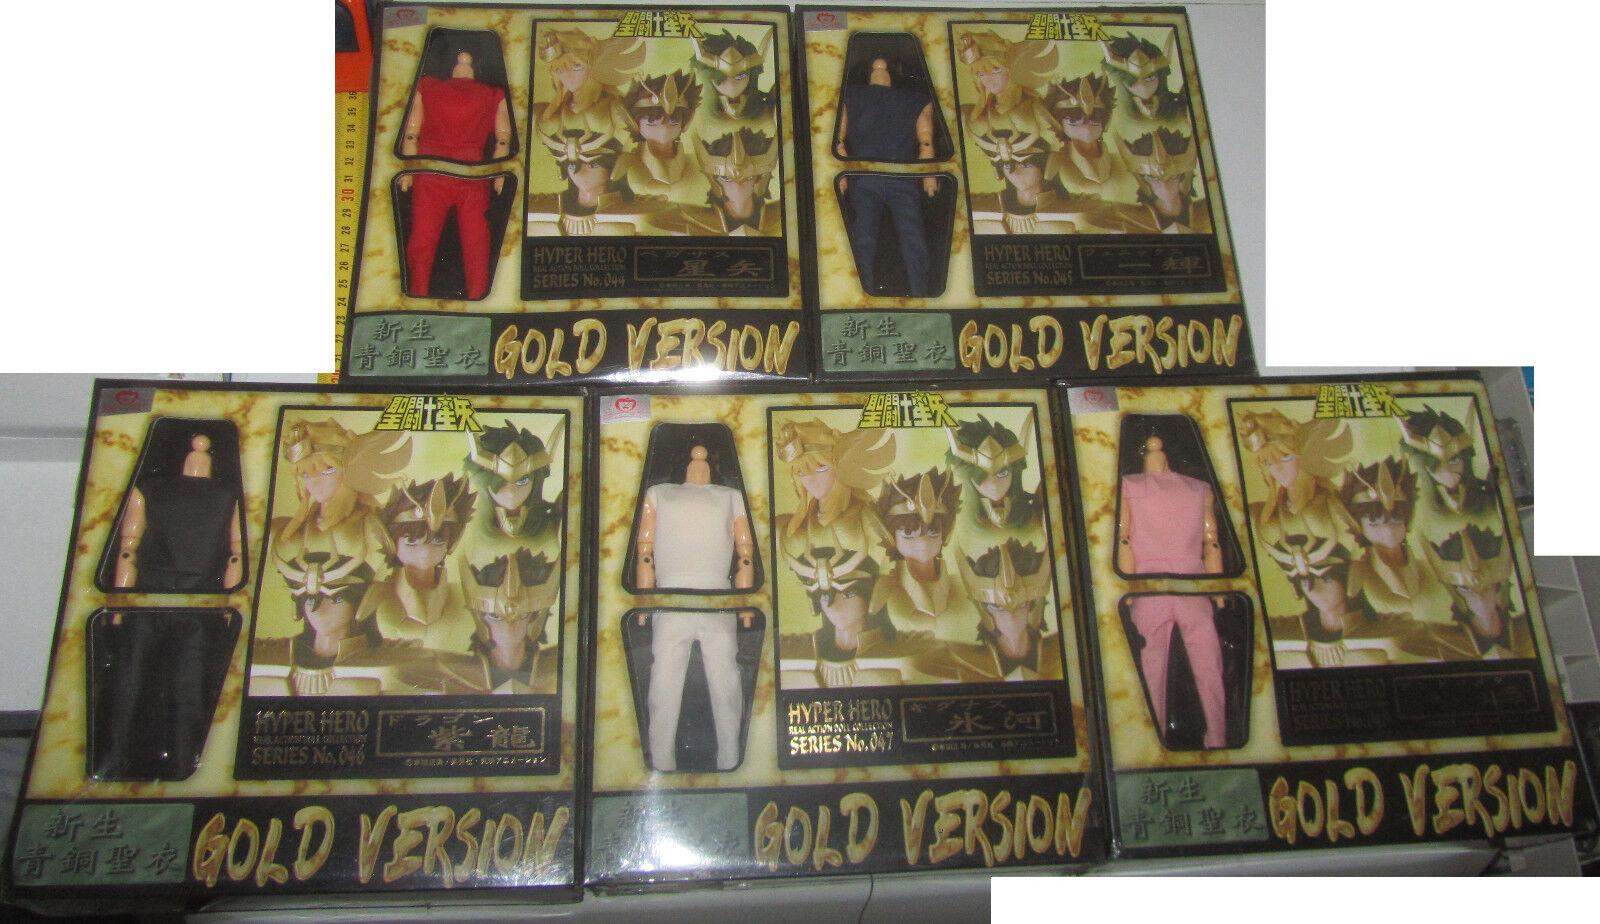 Gold Gold Gold SAINT SEIYA SET Hyper Hero Real Action Doll Cavalieri dello Zodiaco 7beefc